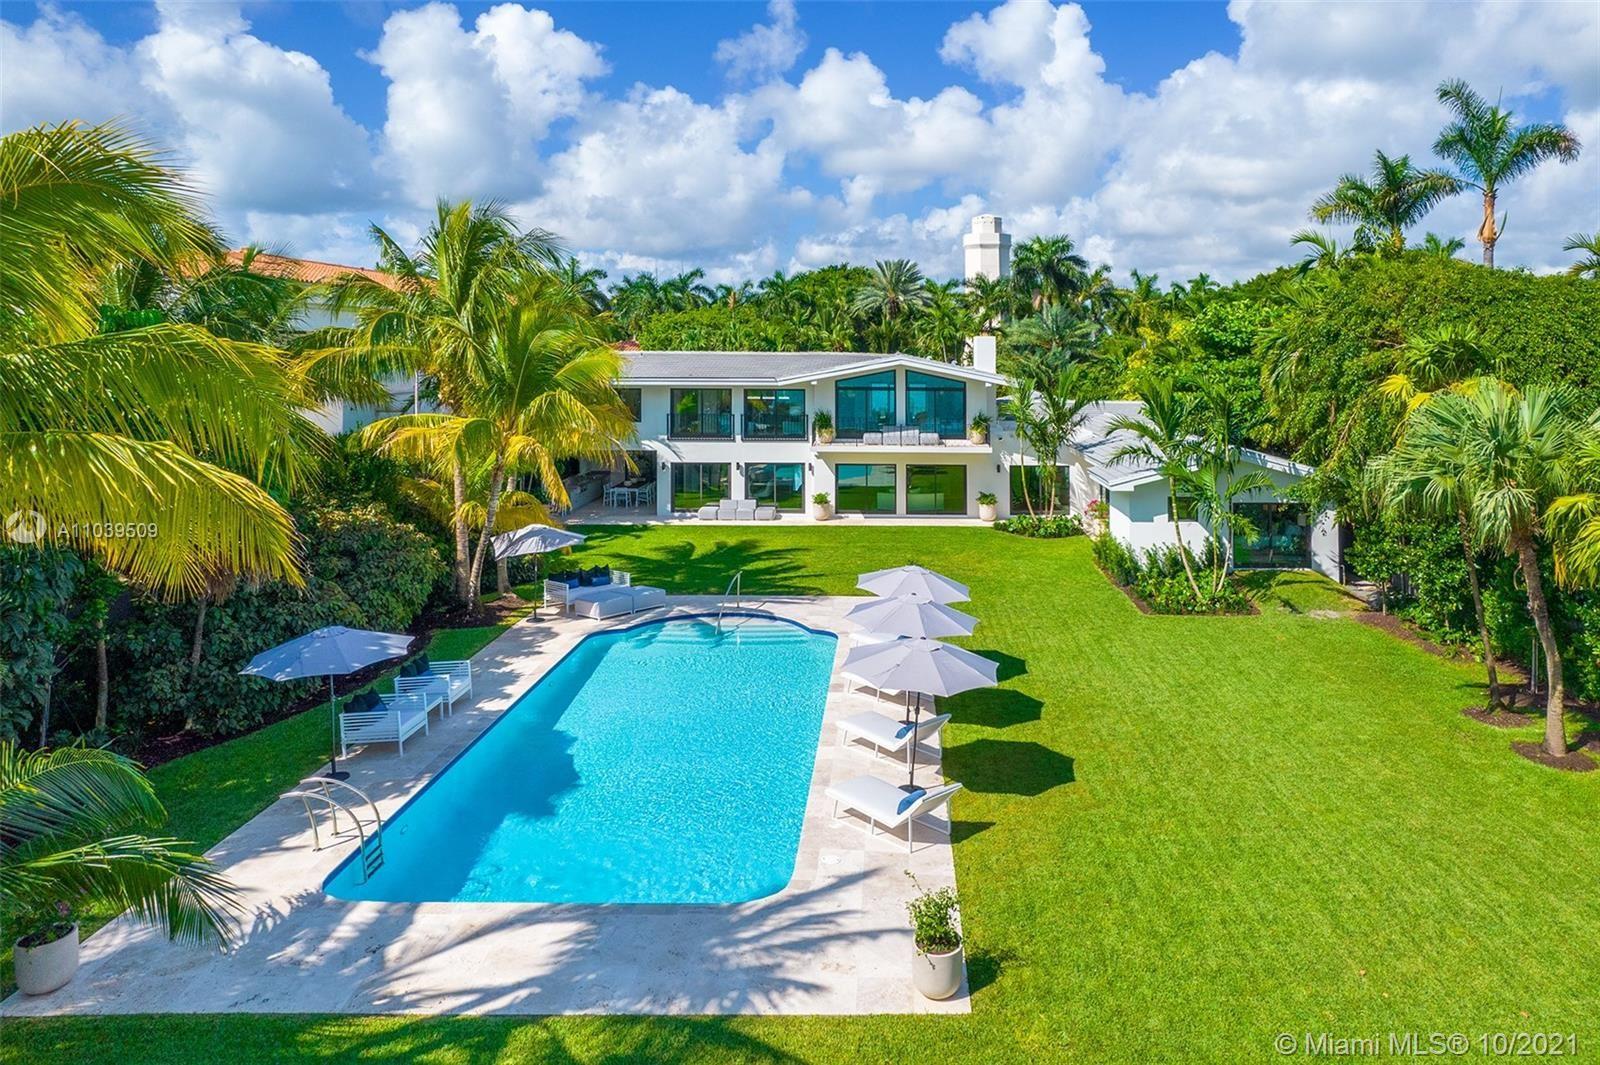 Photo of 34 Star Island Dr, Miami Beach, FL 33139 (MLS # A11039509)